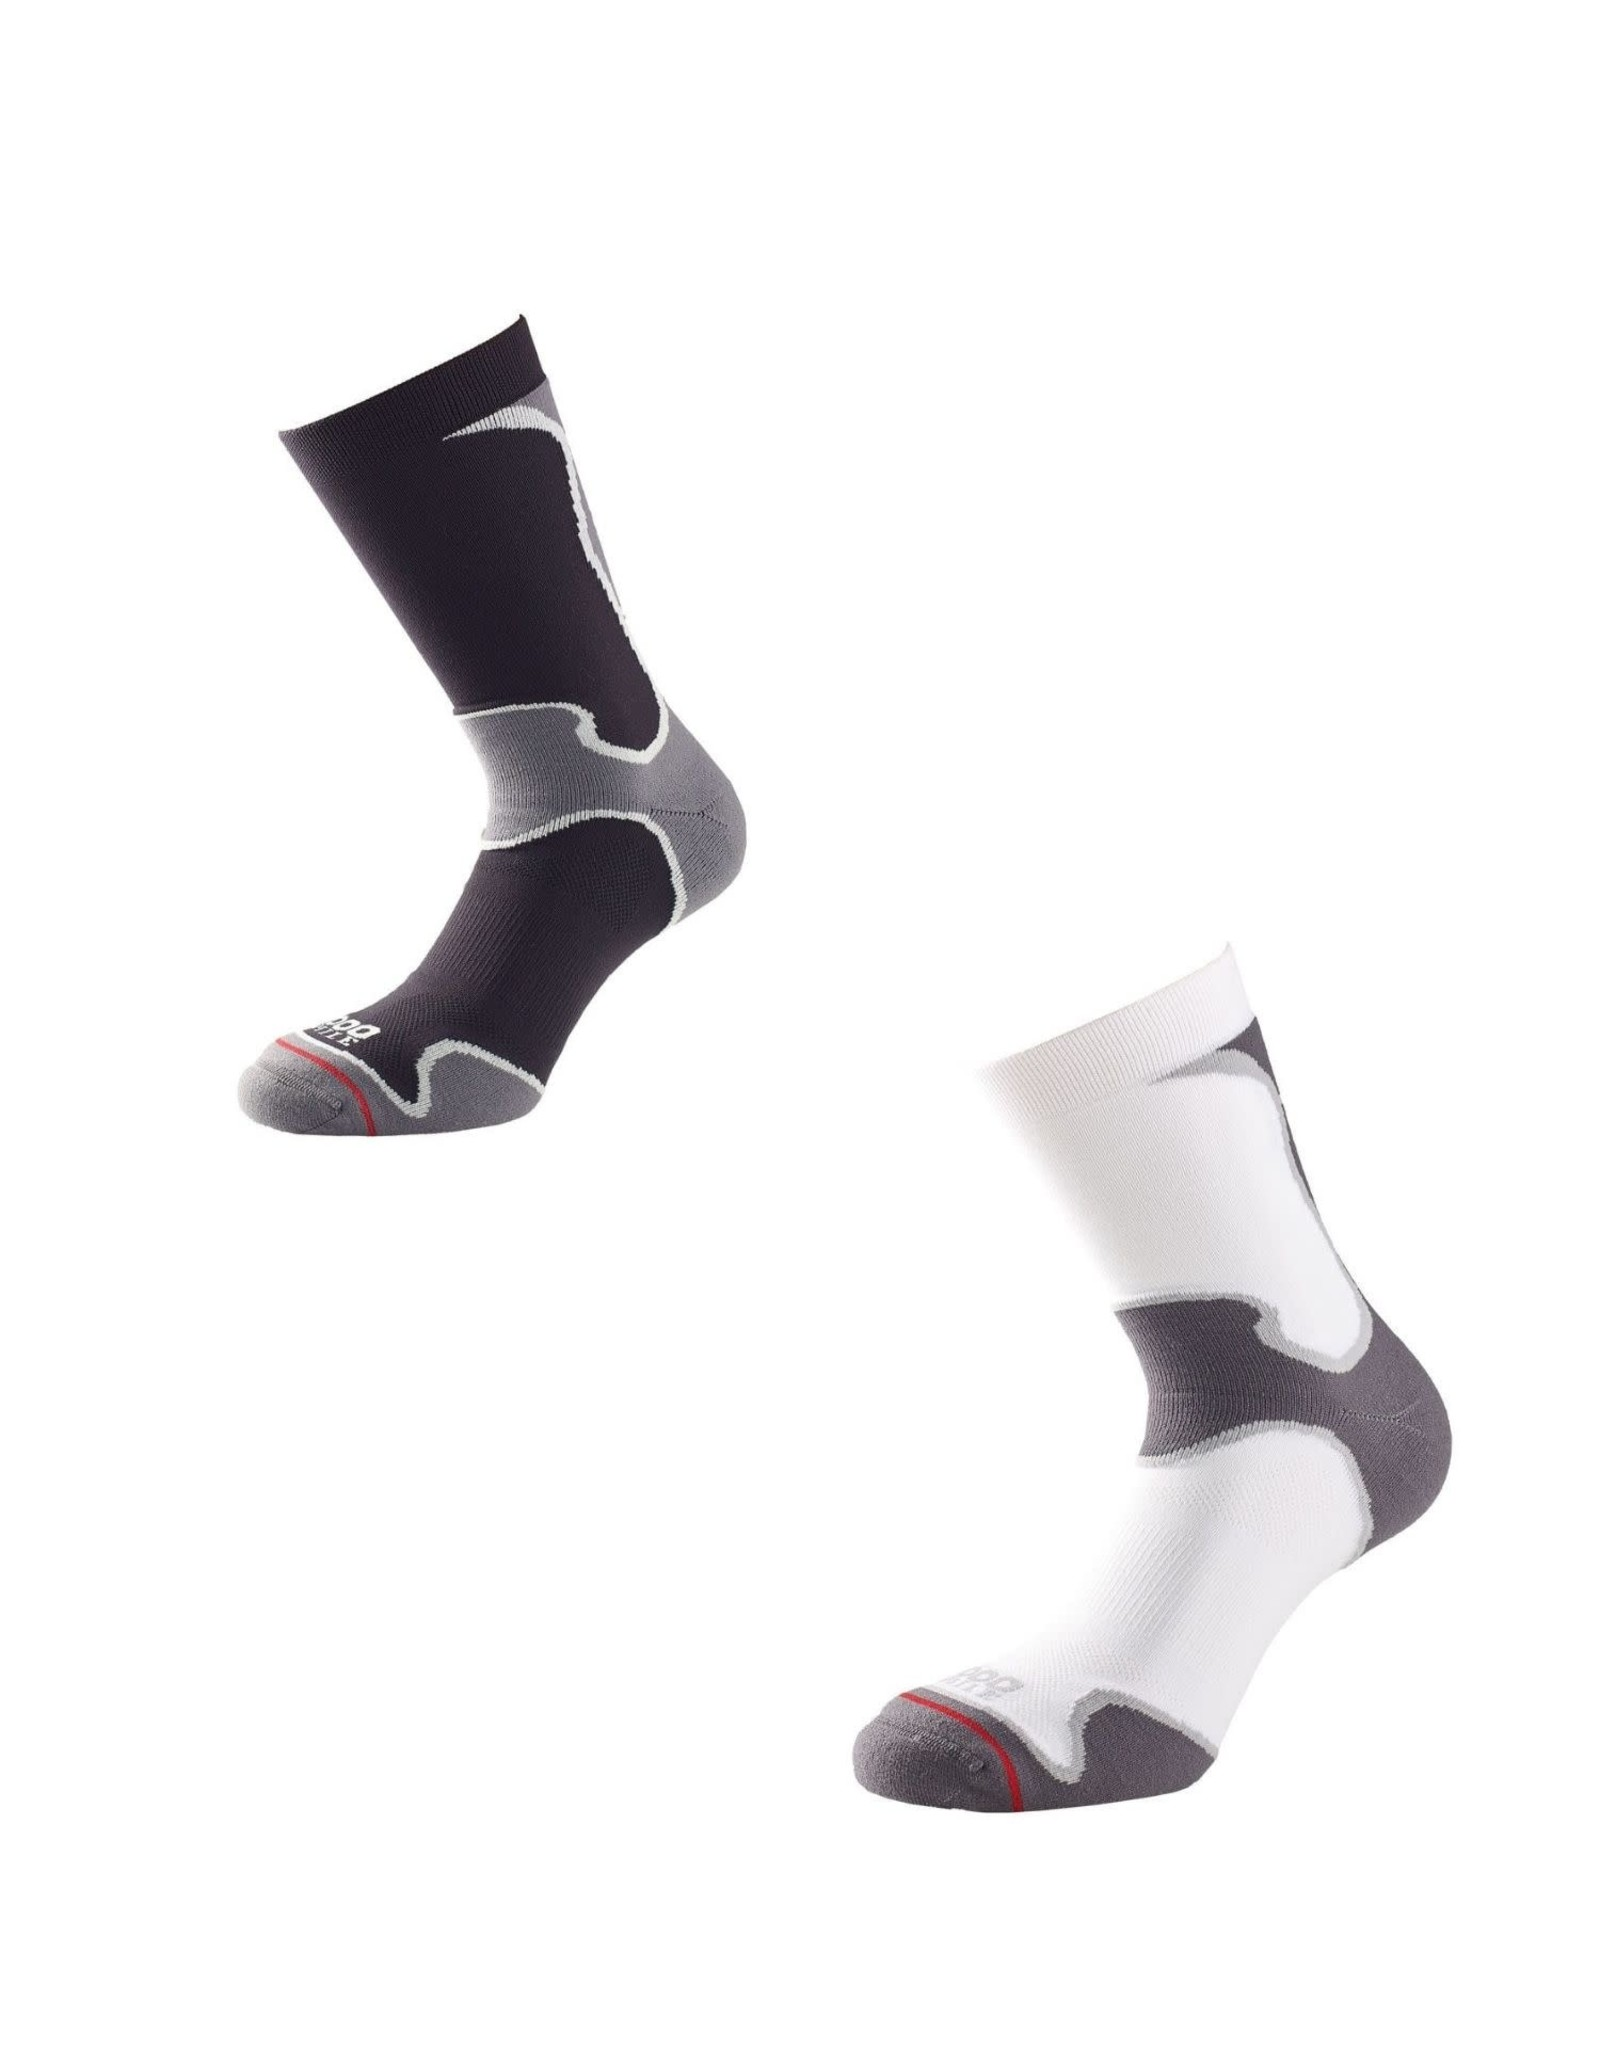 1000MILE Fusion Cycling Sock